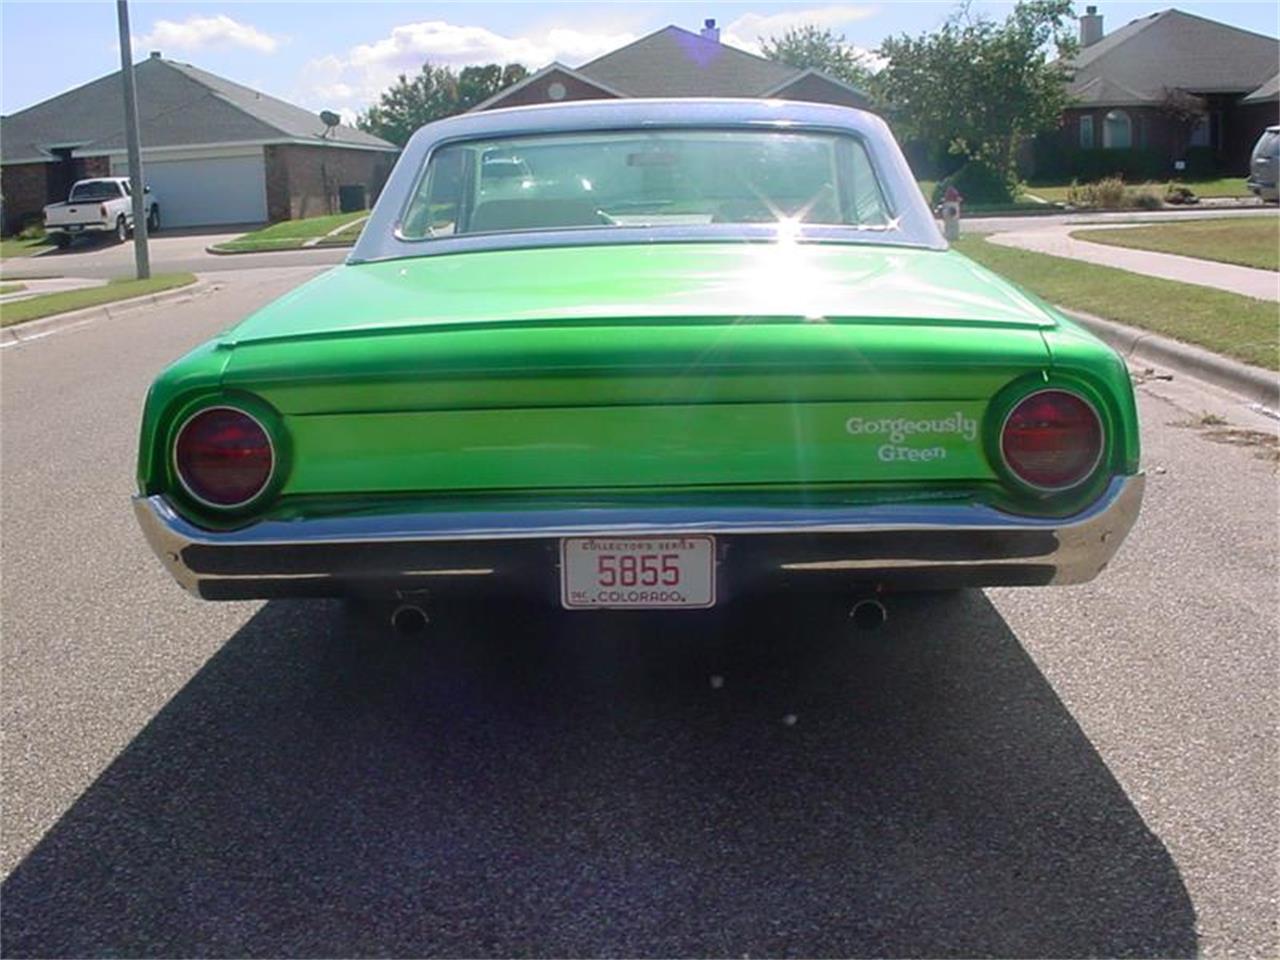 1964 Ford Galaxie 500 (CC-1296468) for sale in San Luis Obispo, California